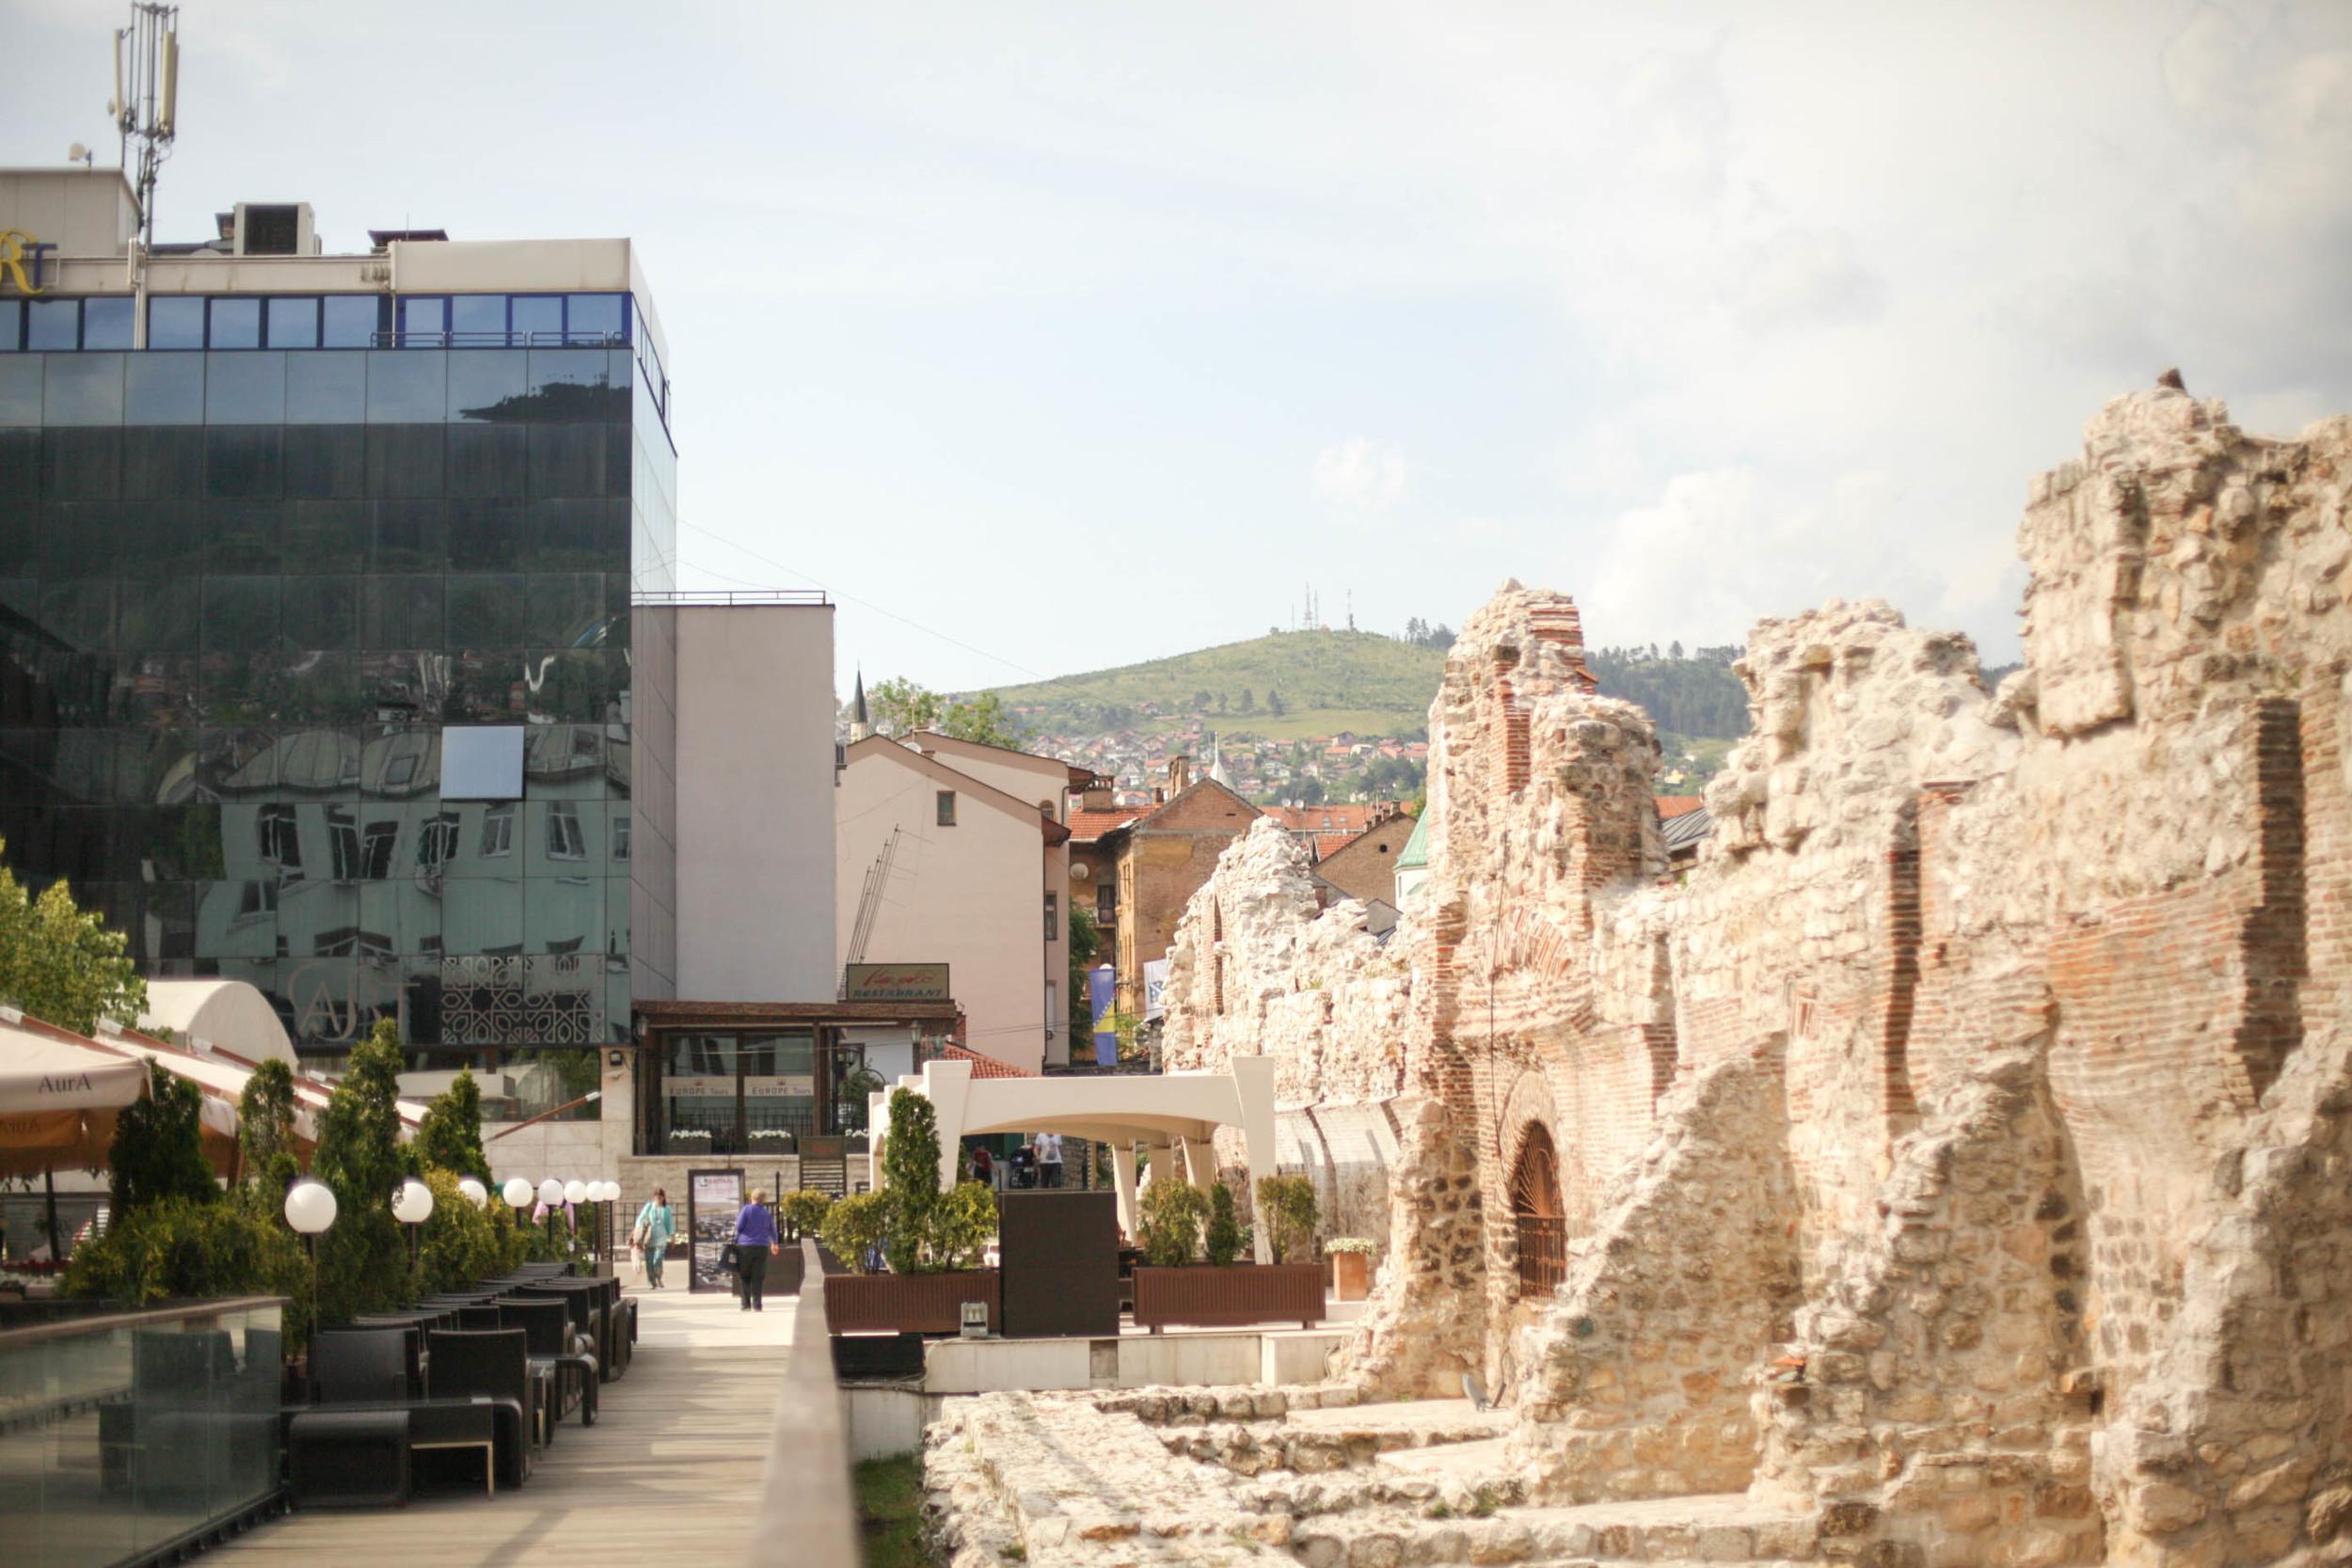 Sarajevo - old meeting new.